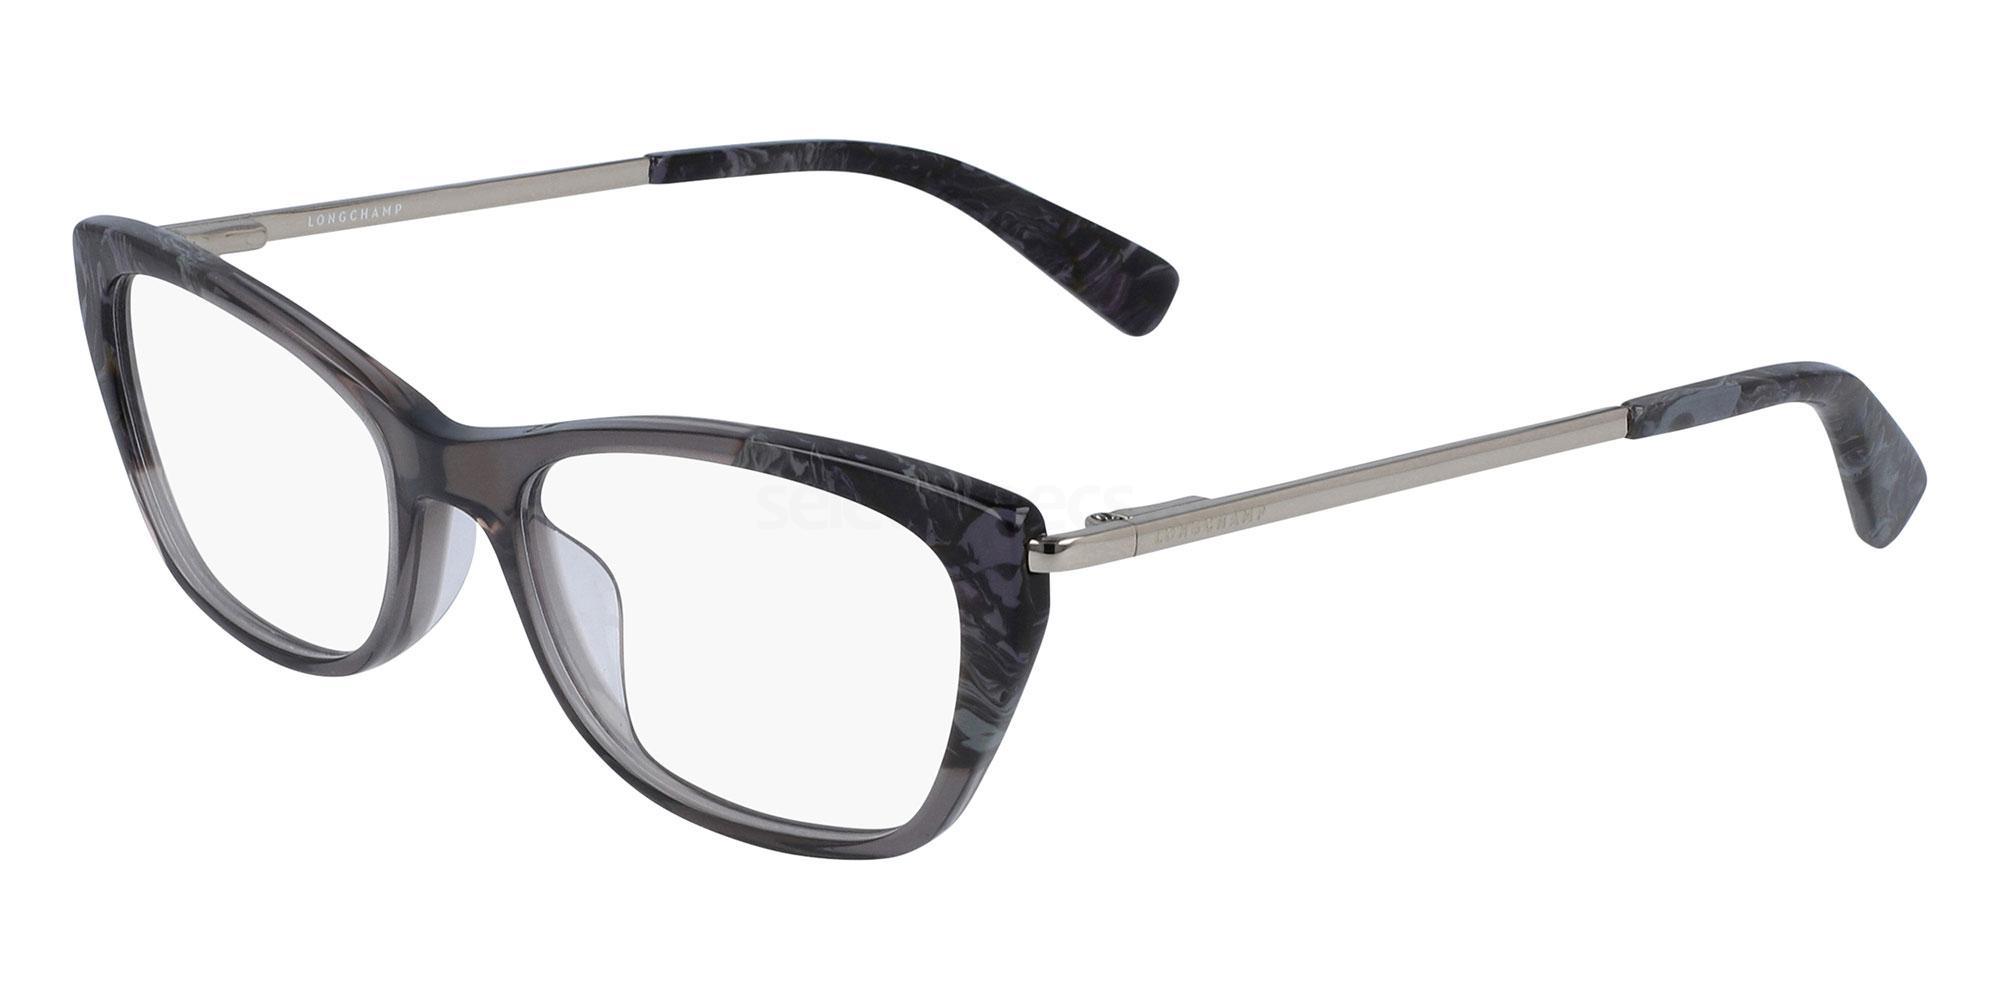 036 LO2639 Glasses, LONGCHAMP